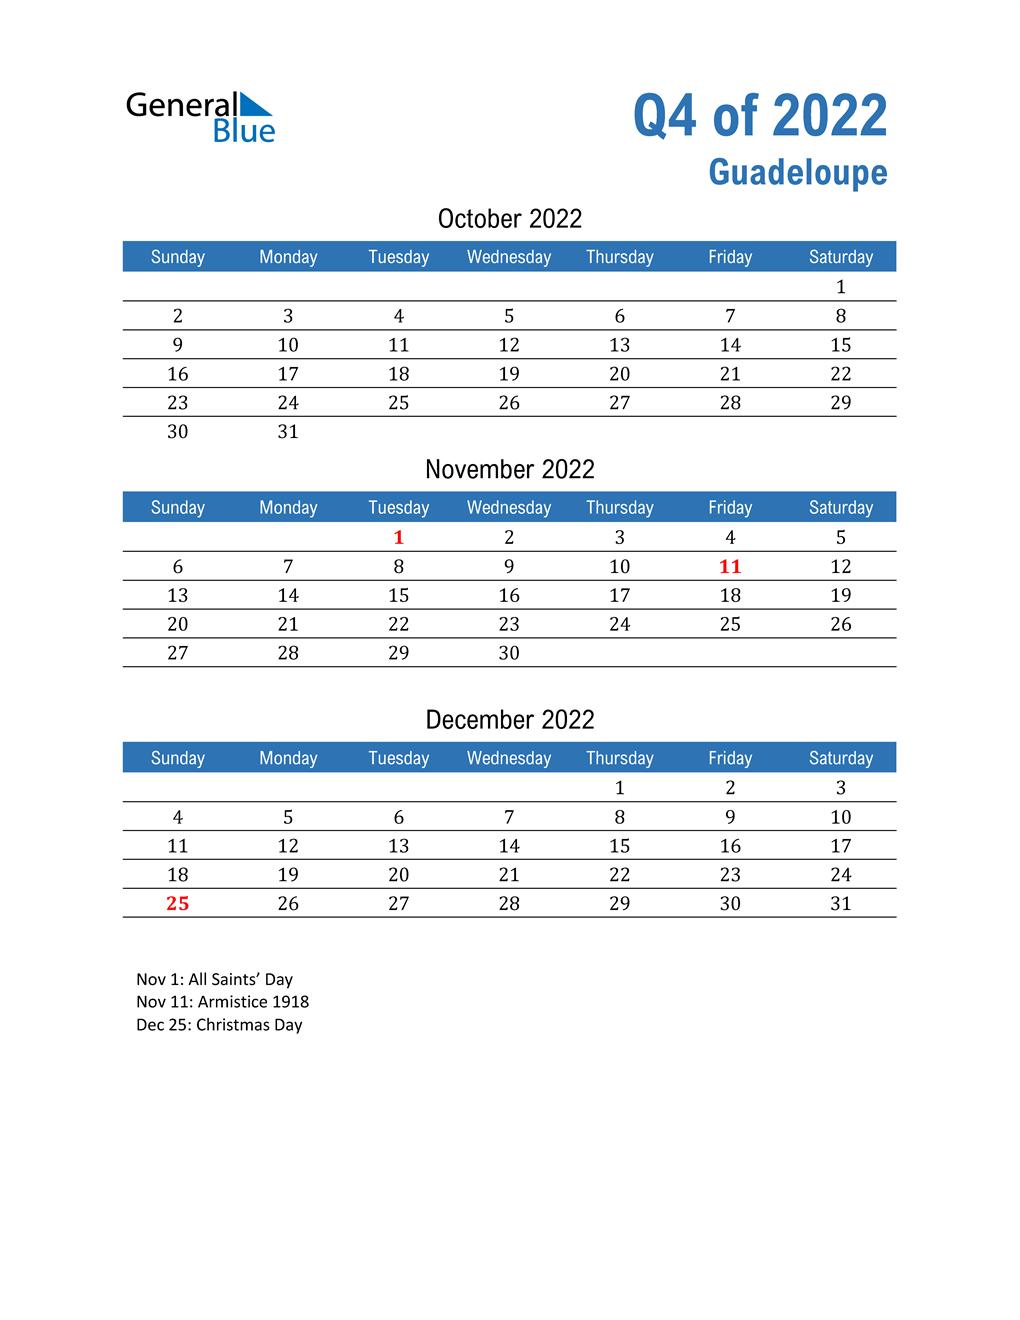 Guadeloupe 2022 Quarterly Calendar